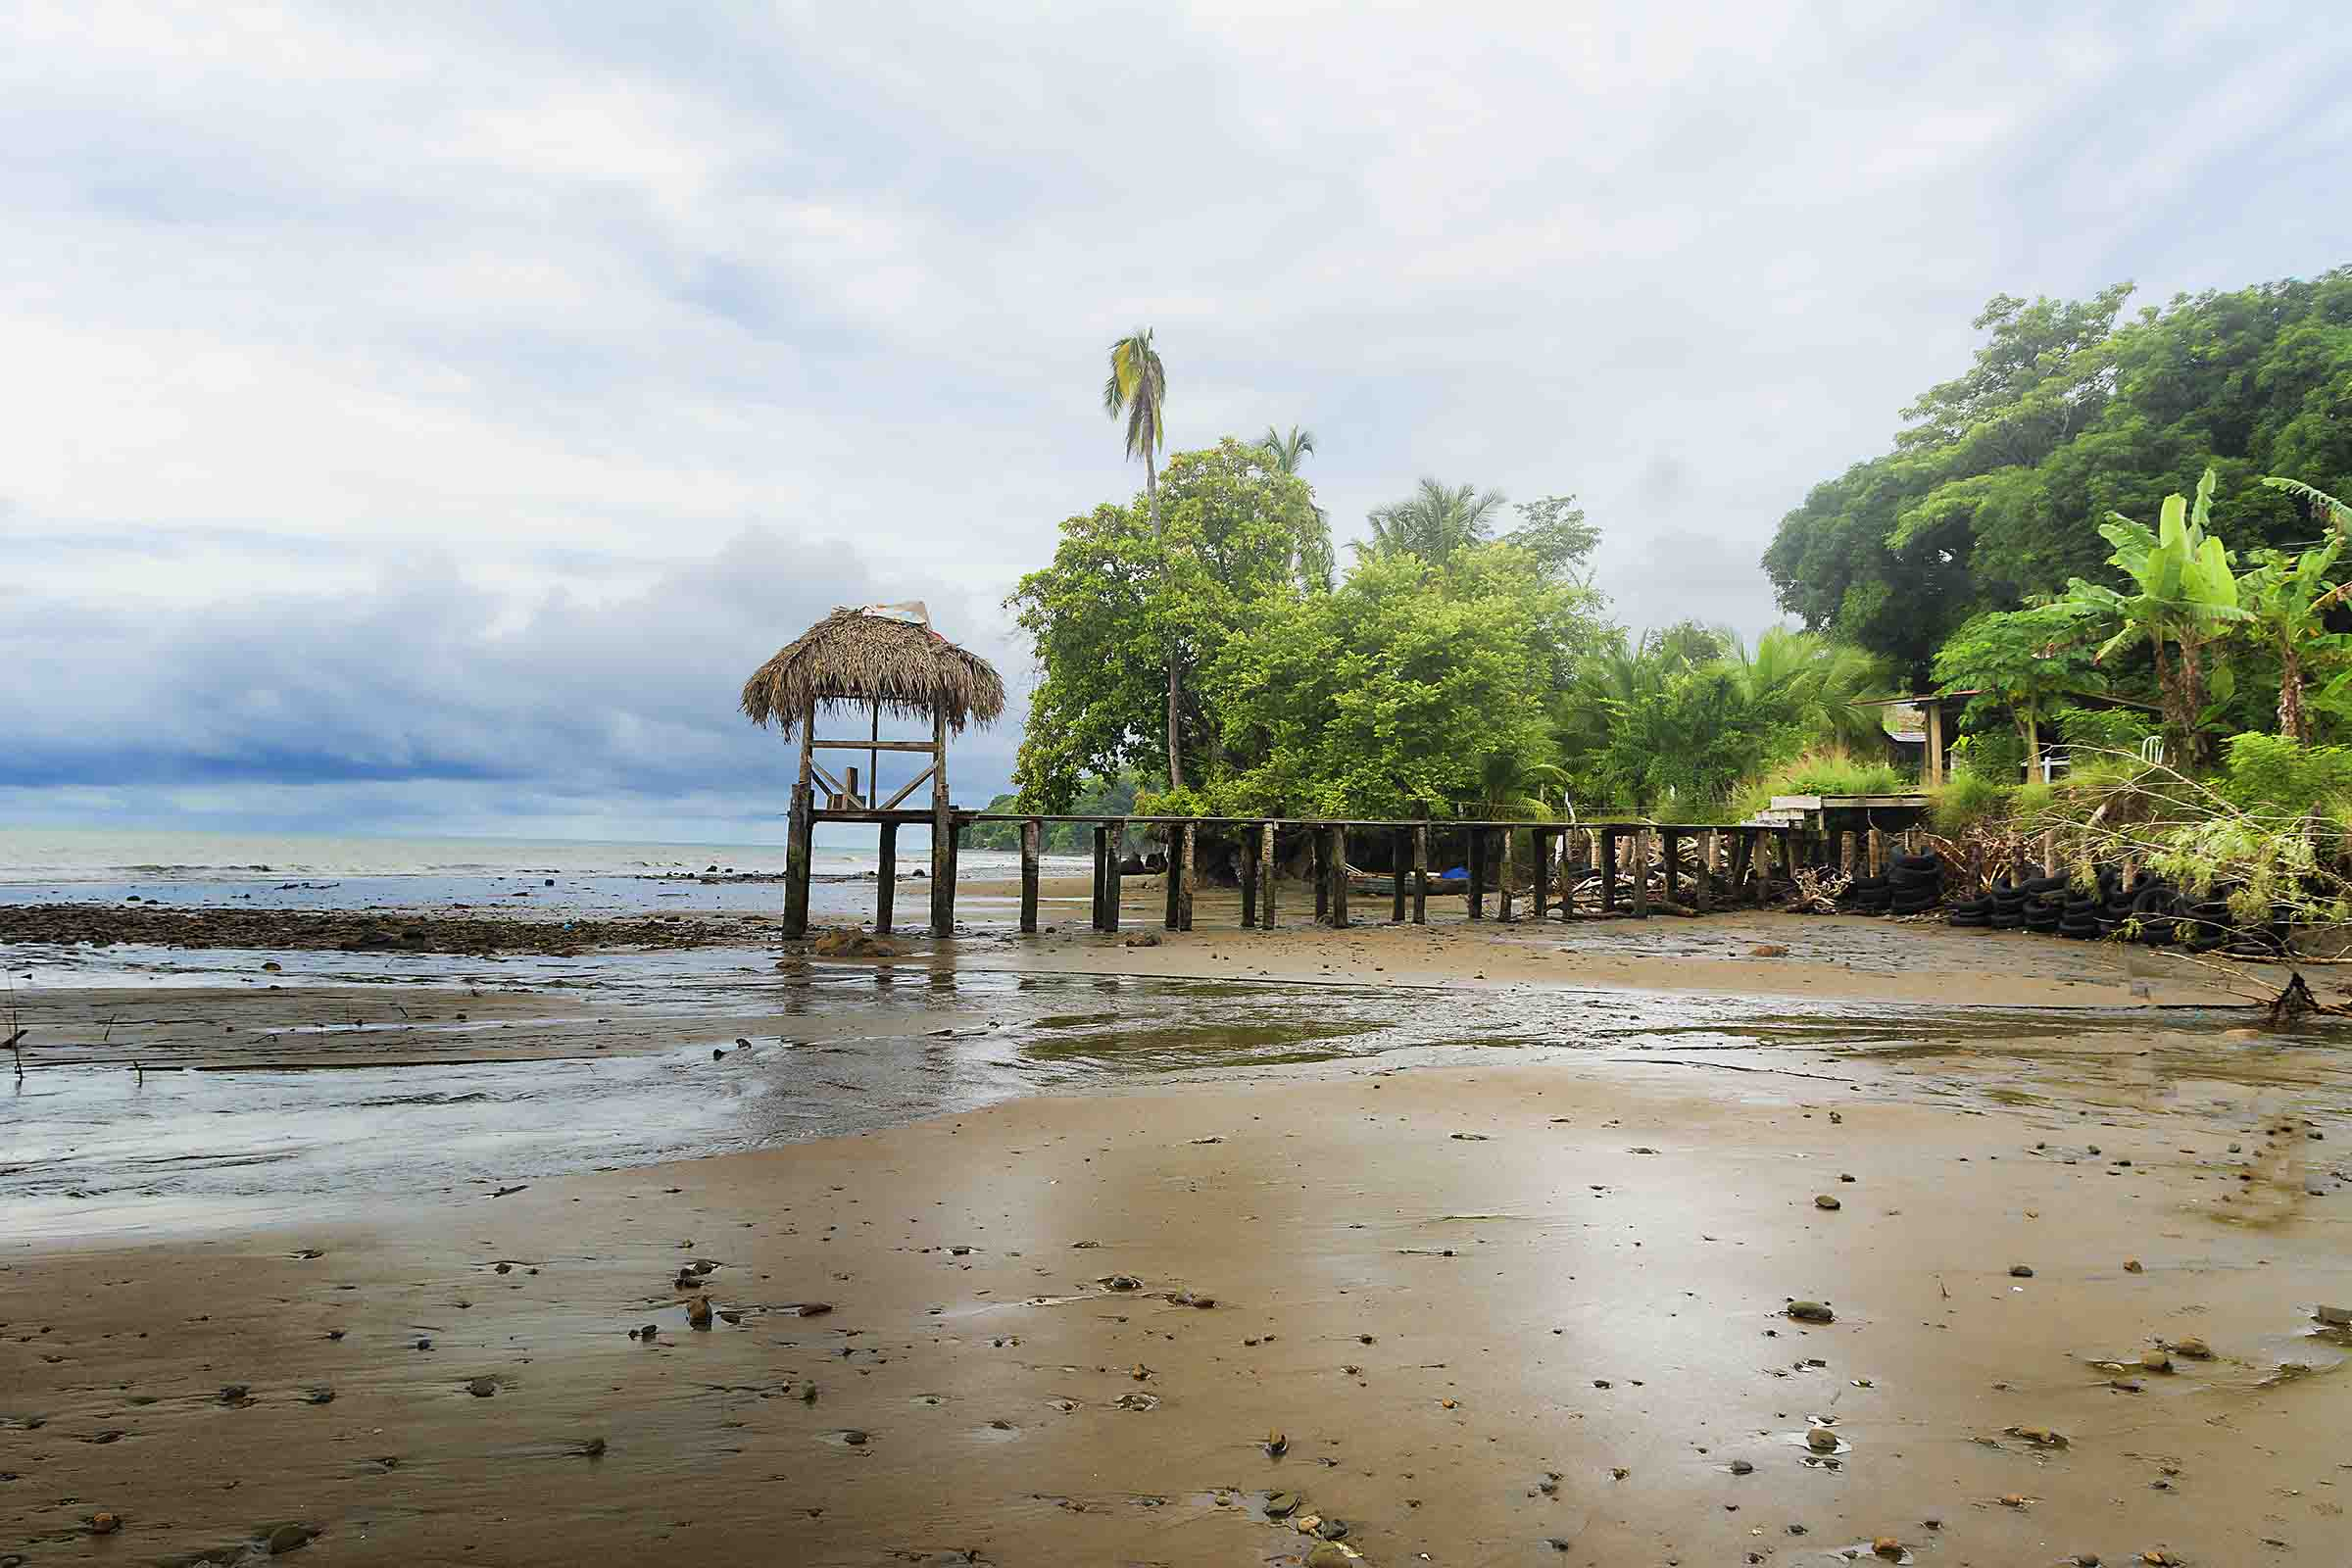 Hooked-on-Panama-Beach-2-1 Doggy Bliss at Hooked on Panama Panama Pets